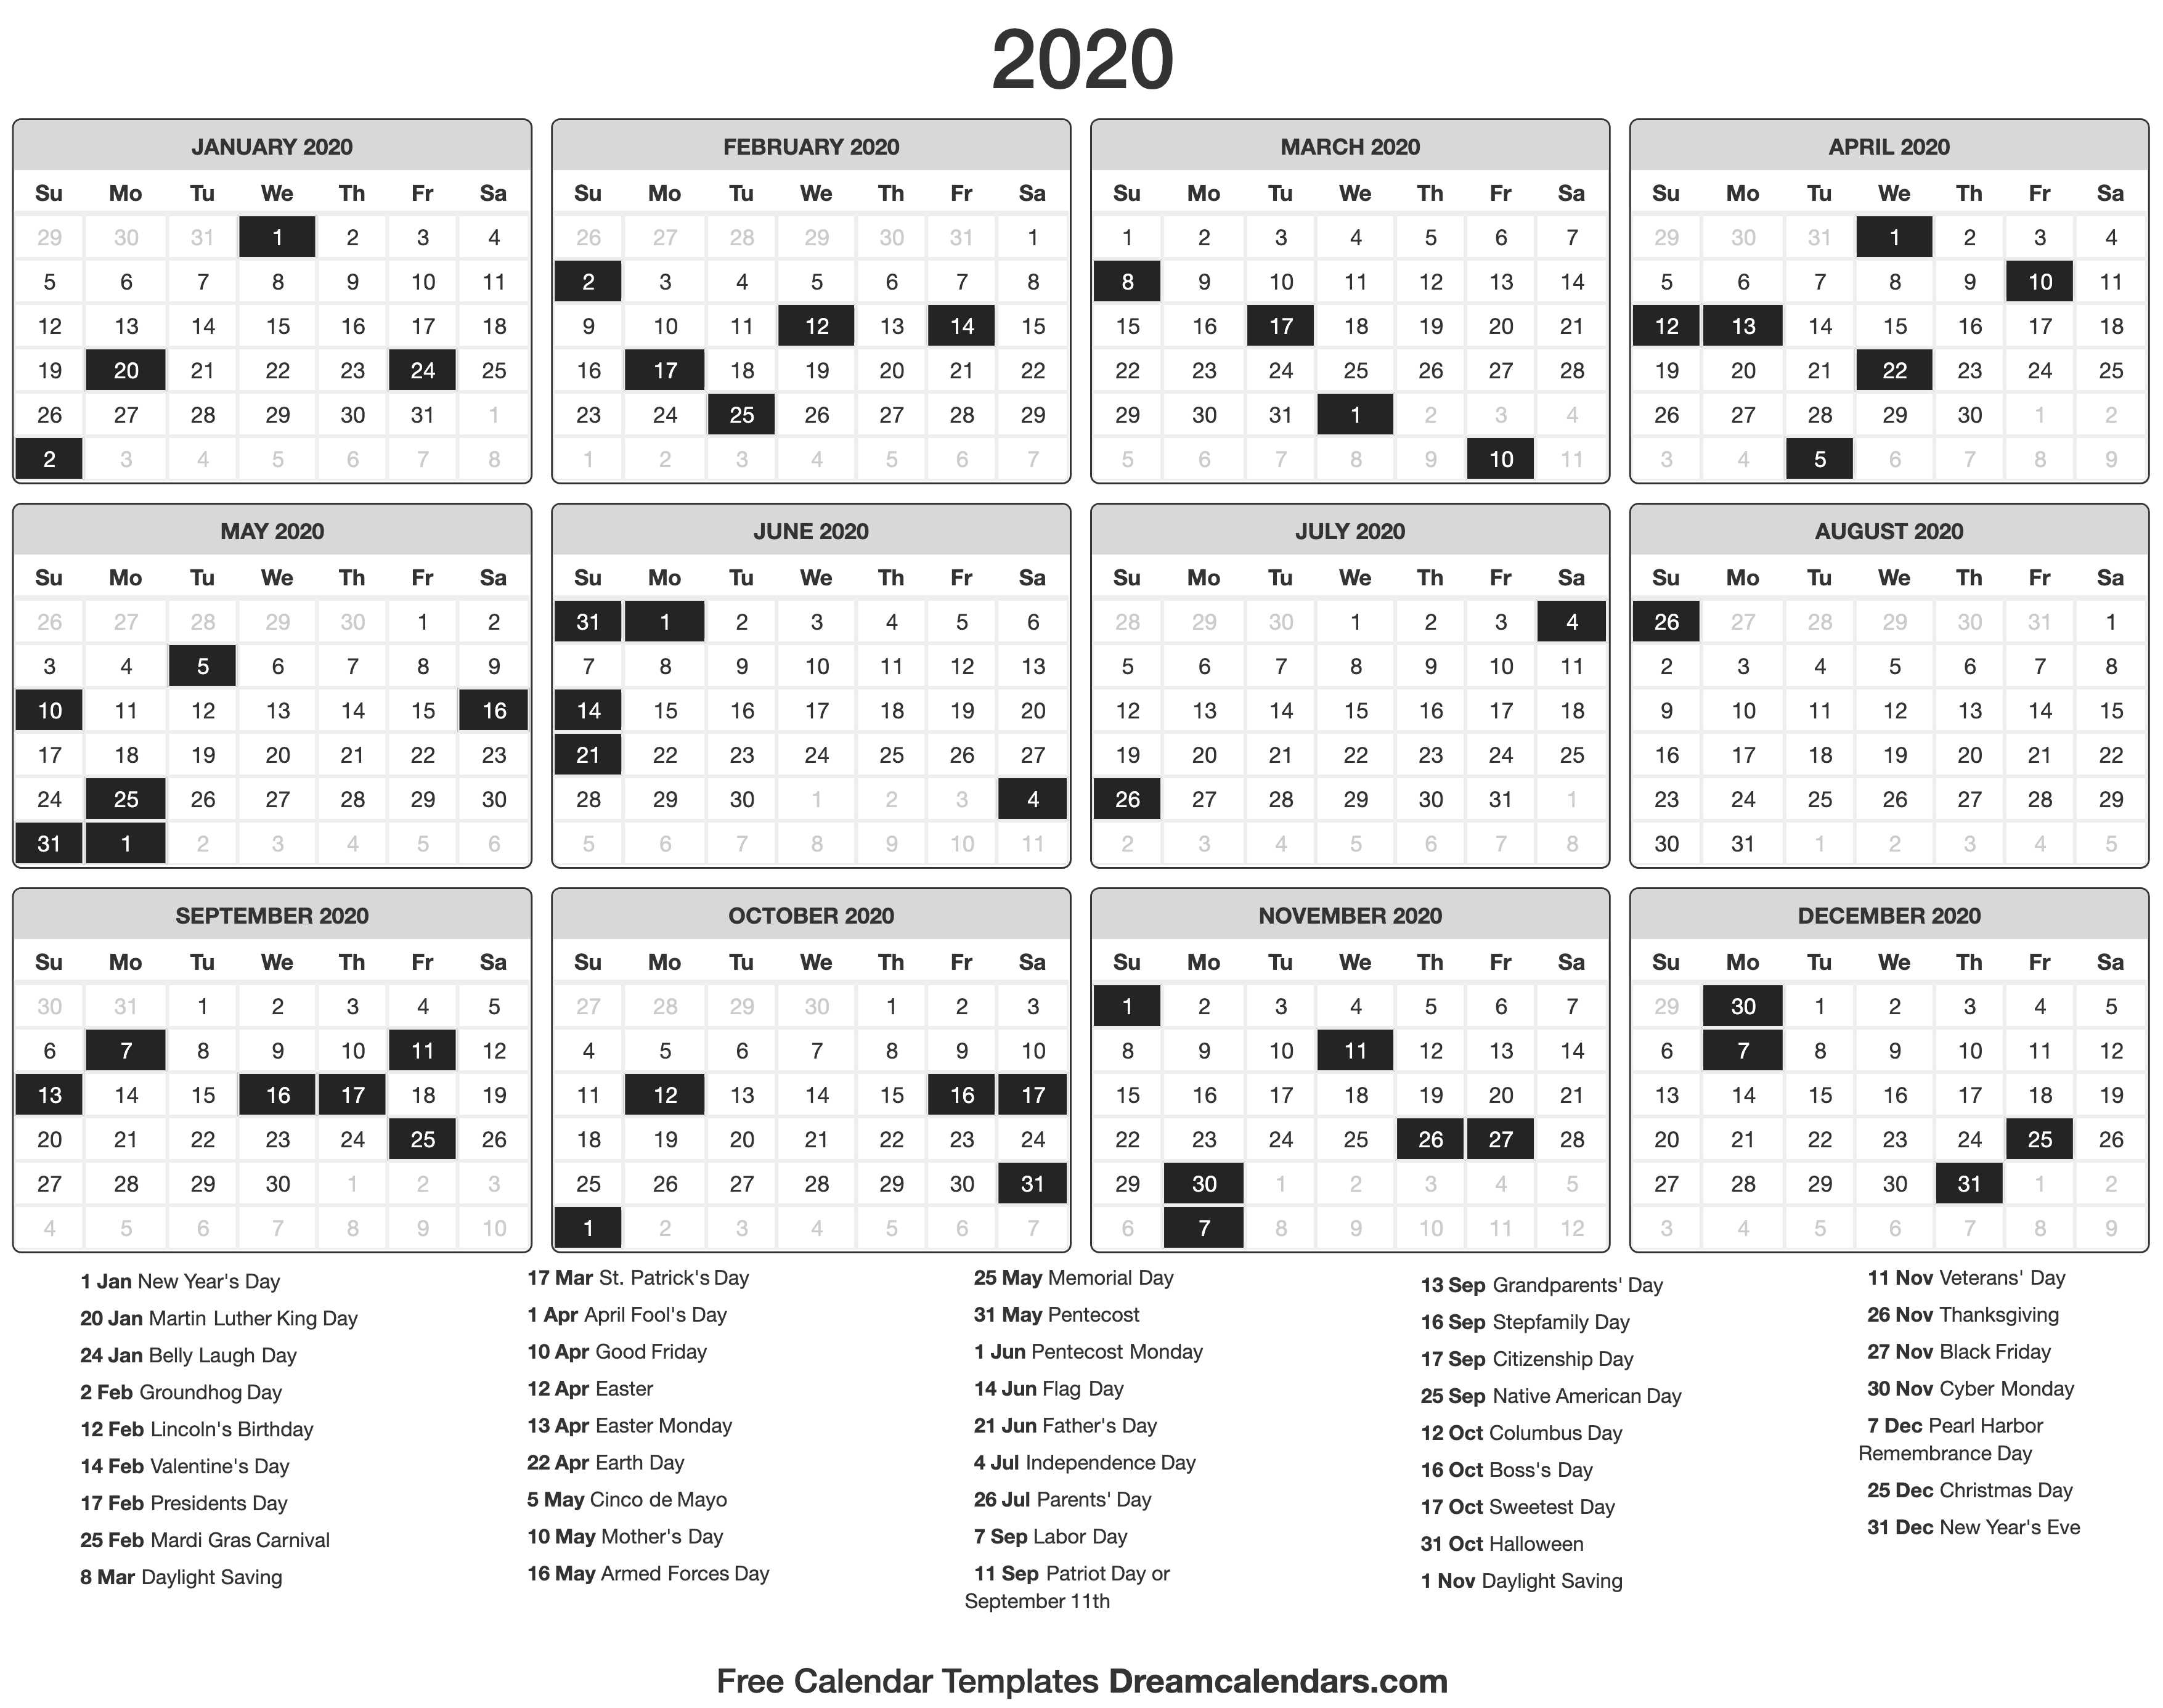 2020 Calendar for September Thru December 2020 Calendar